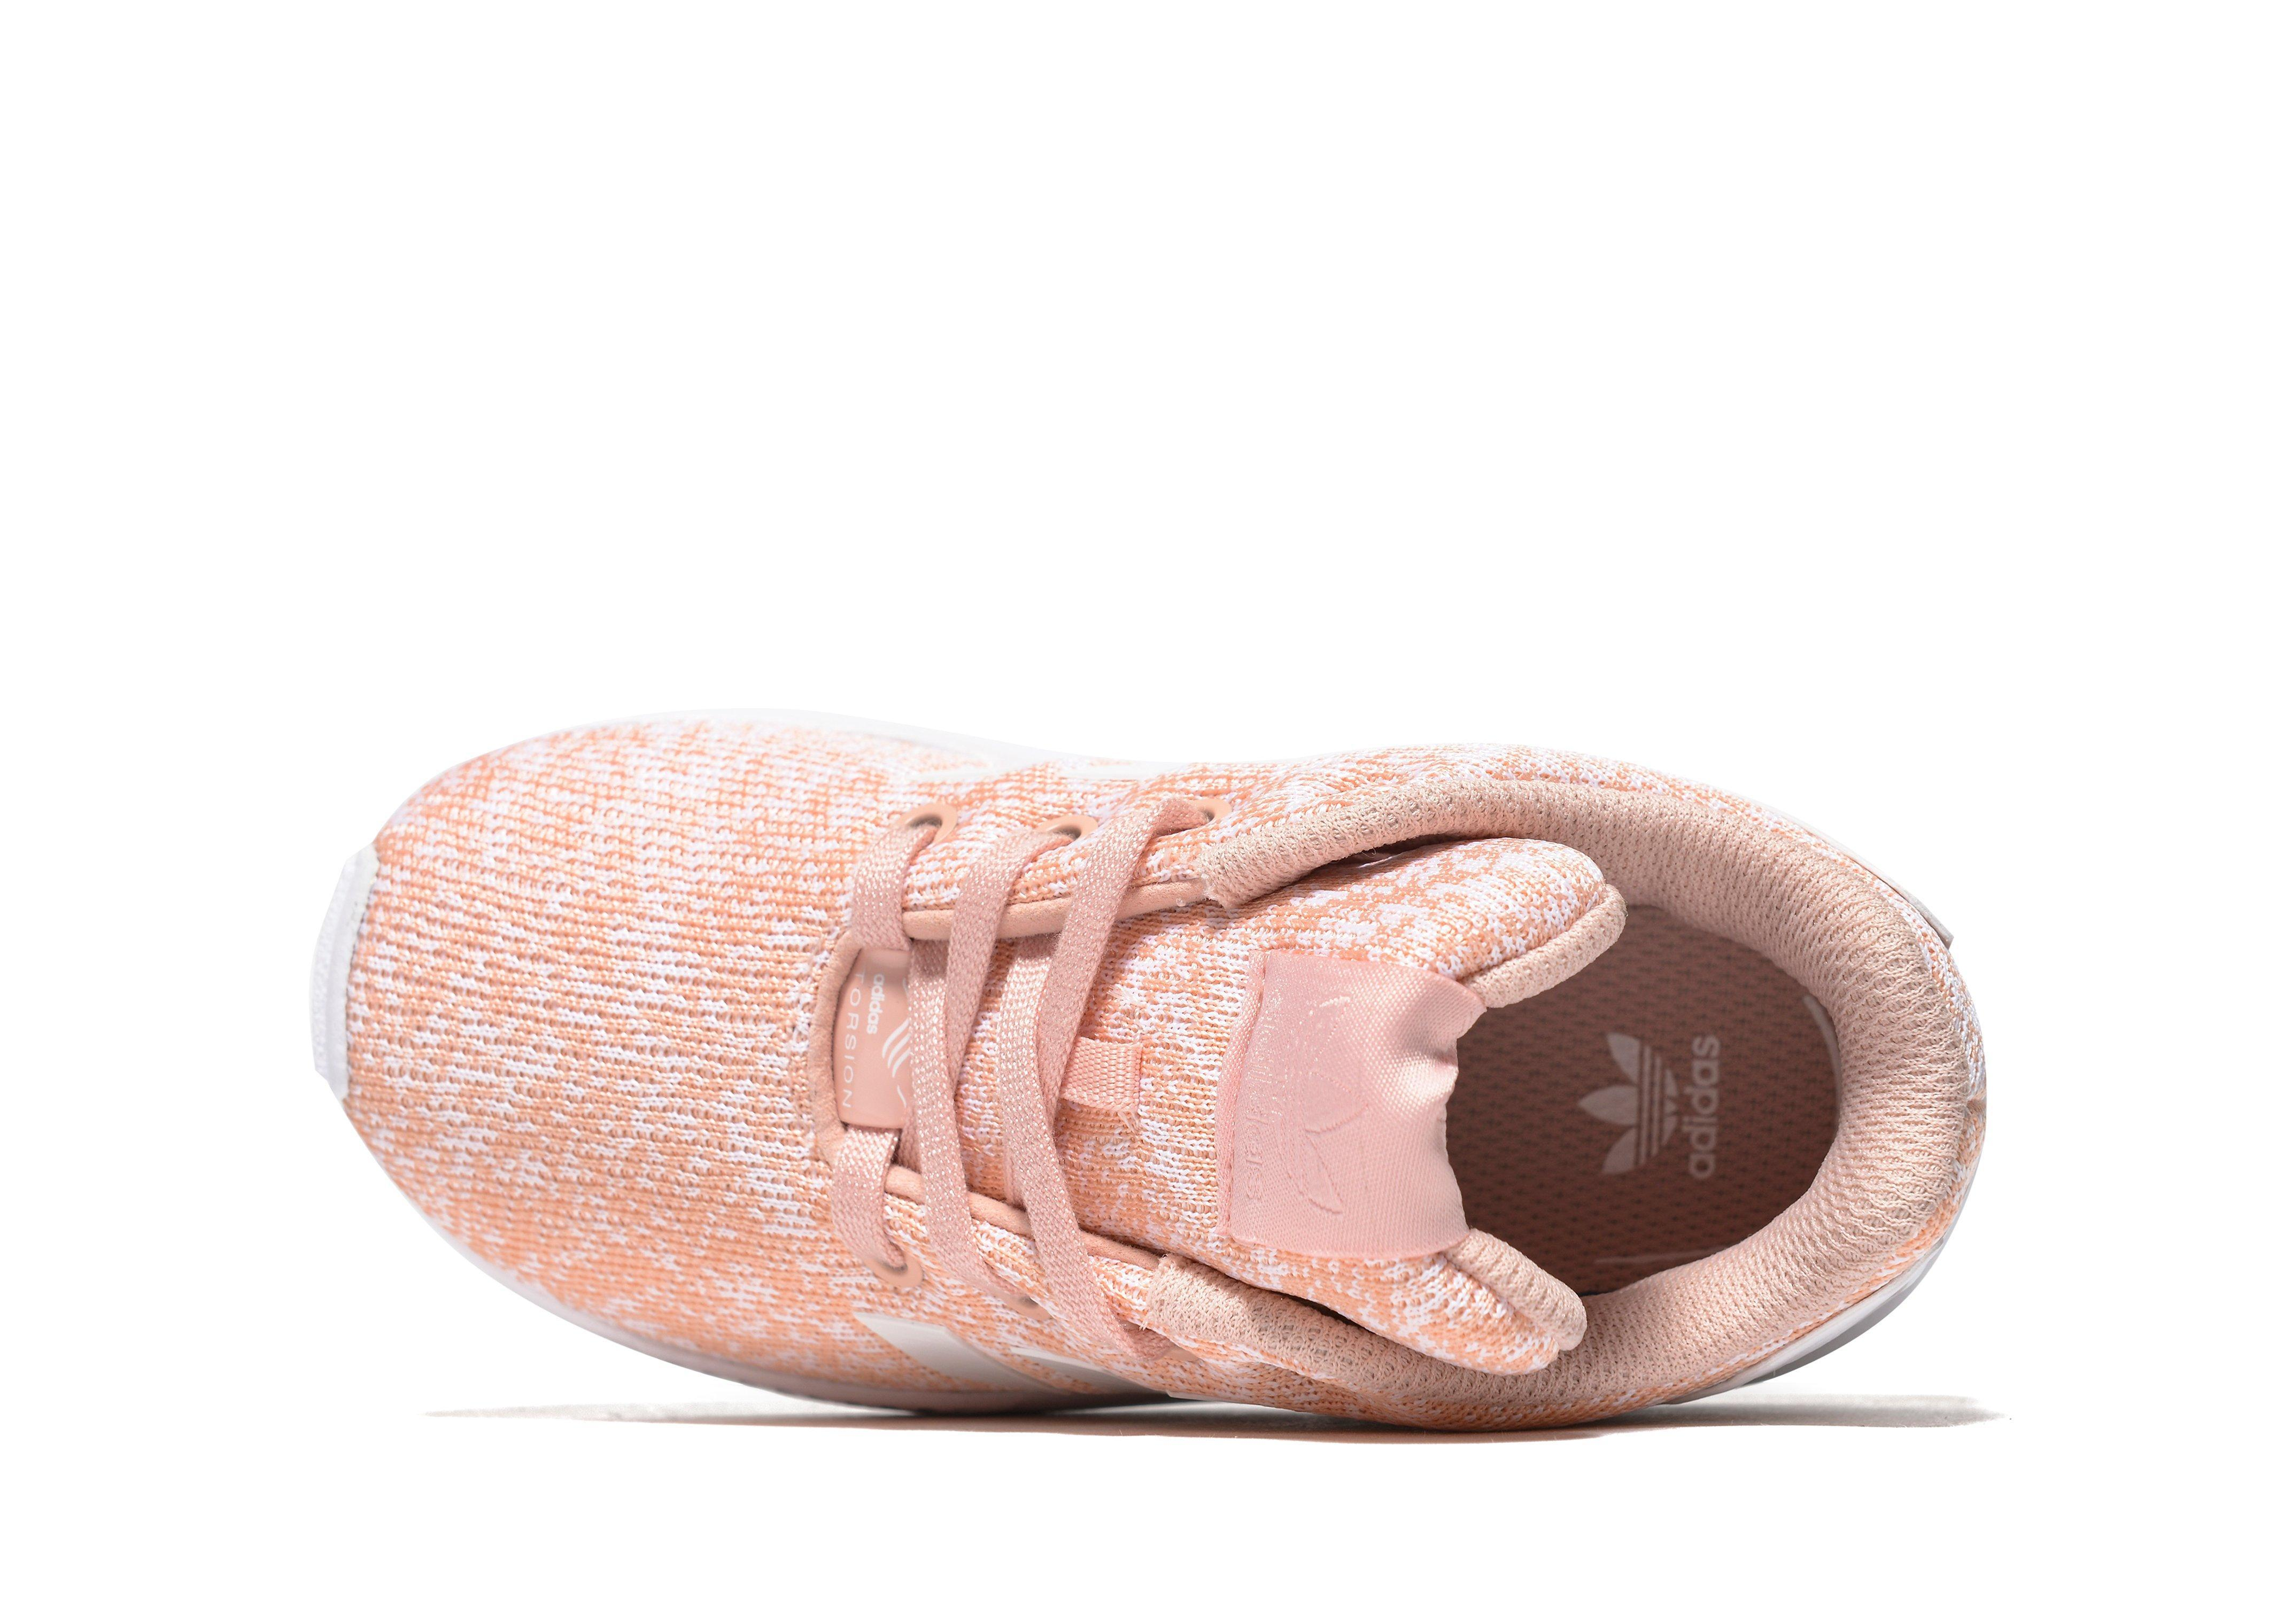 da14f7ae4560 ... cheap lyst adidas originals zx flux infant in pink f88e8 cb795